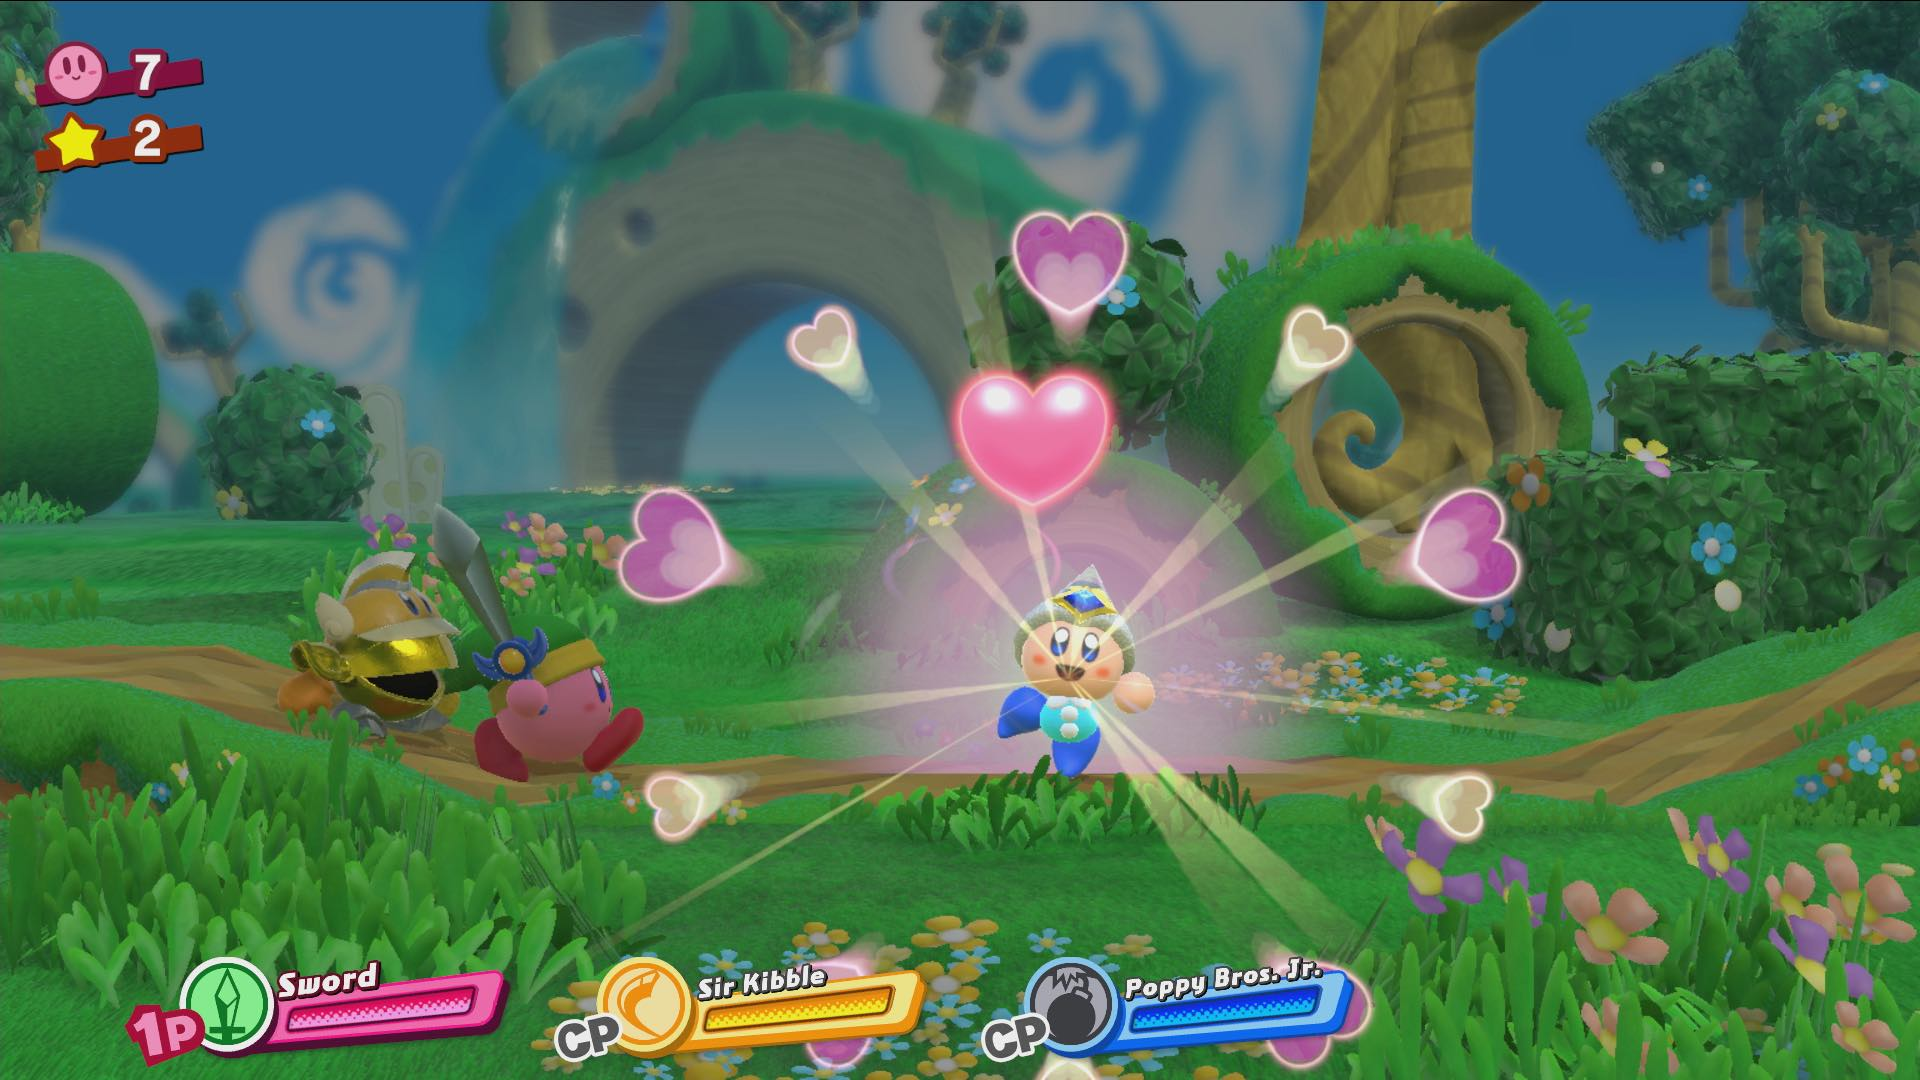 Switch_Kirby_E3-2017-SCRN_050